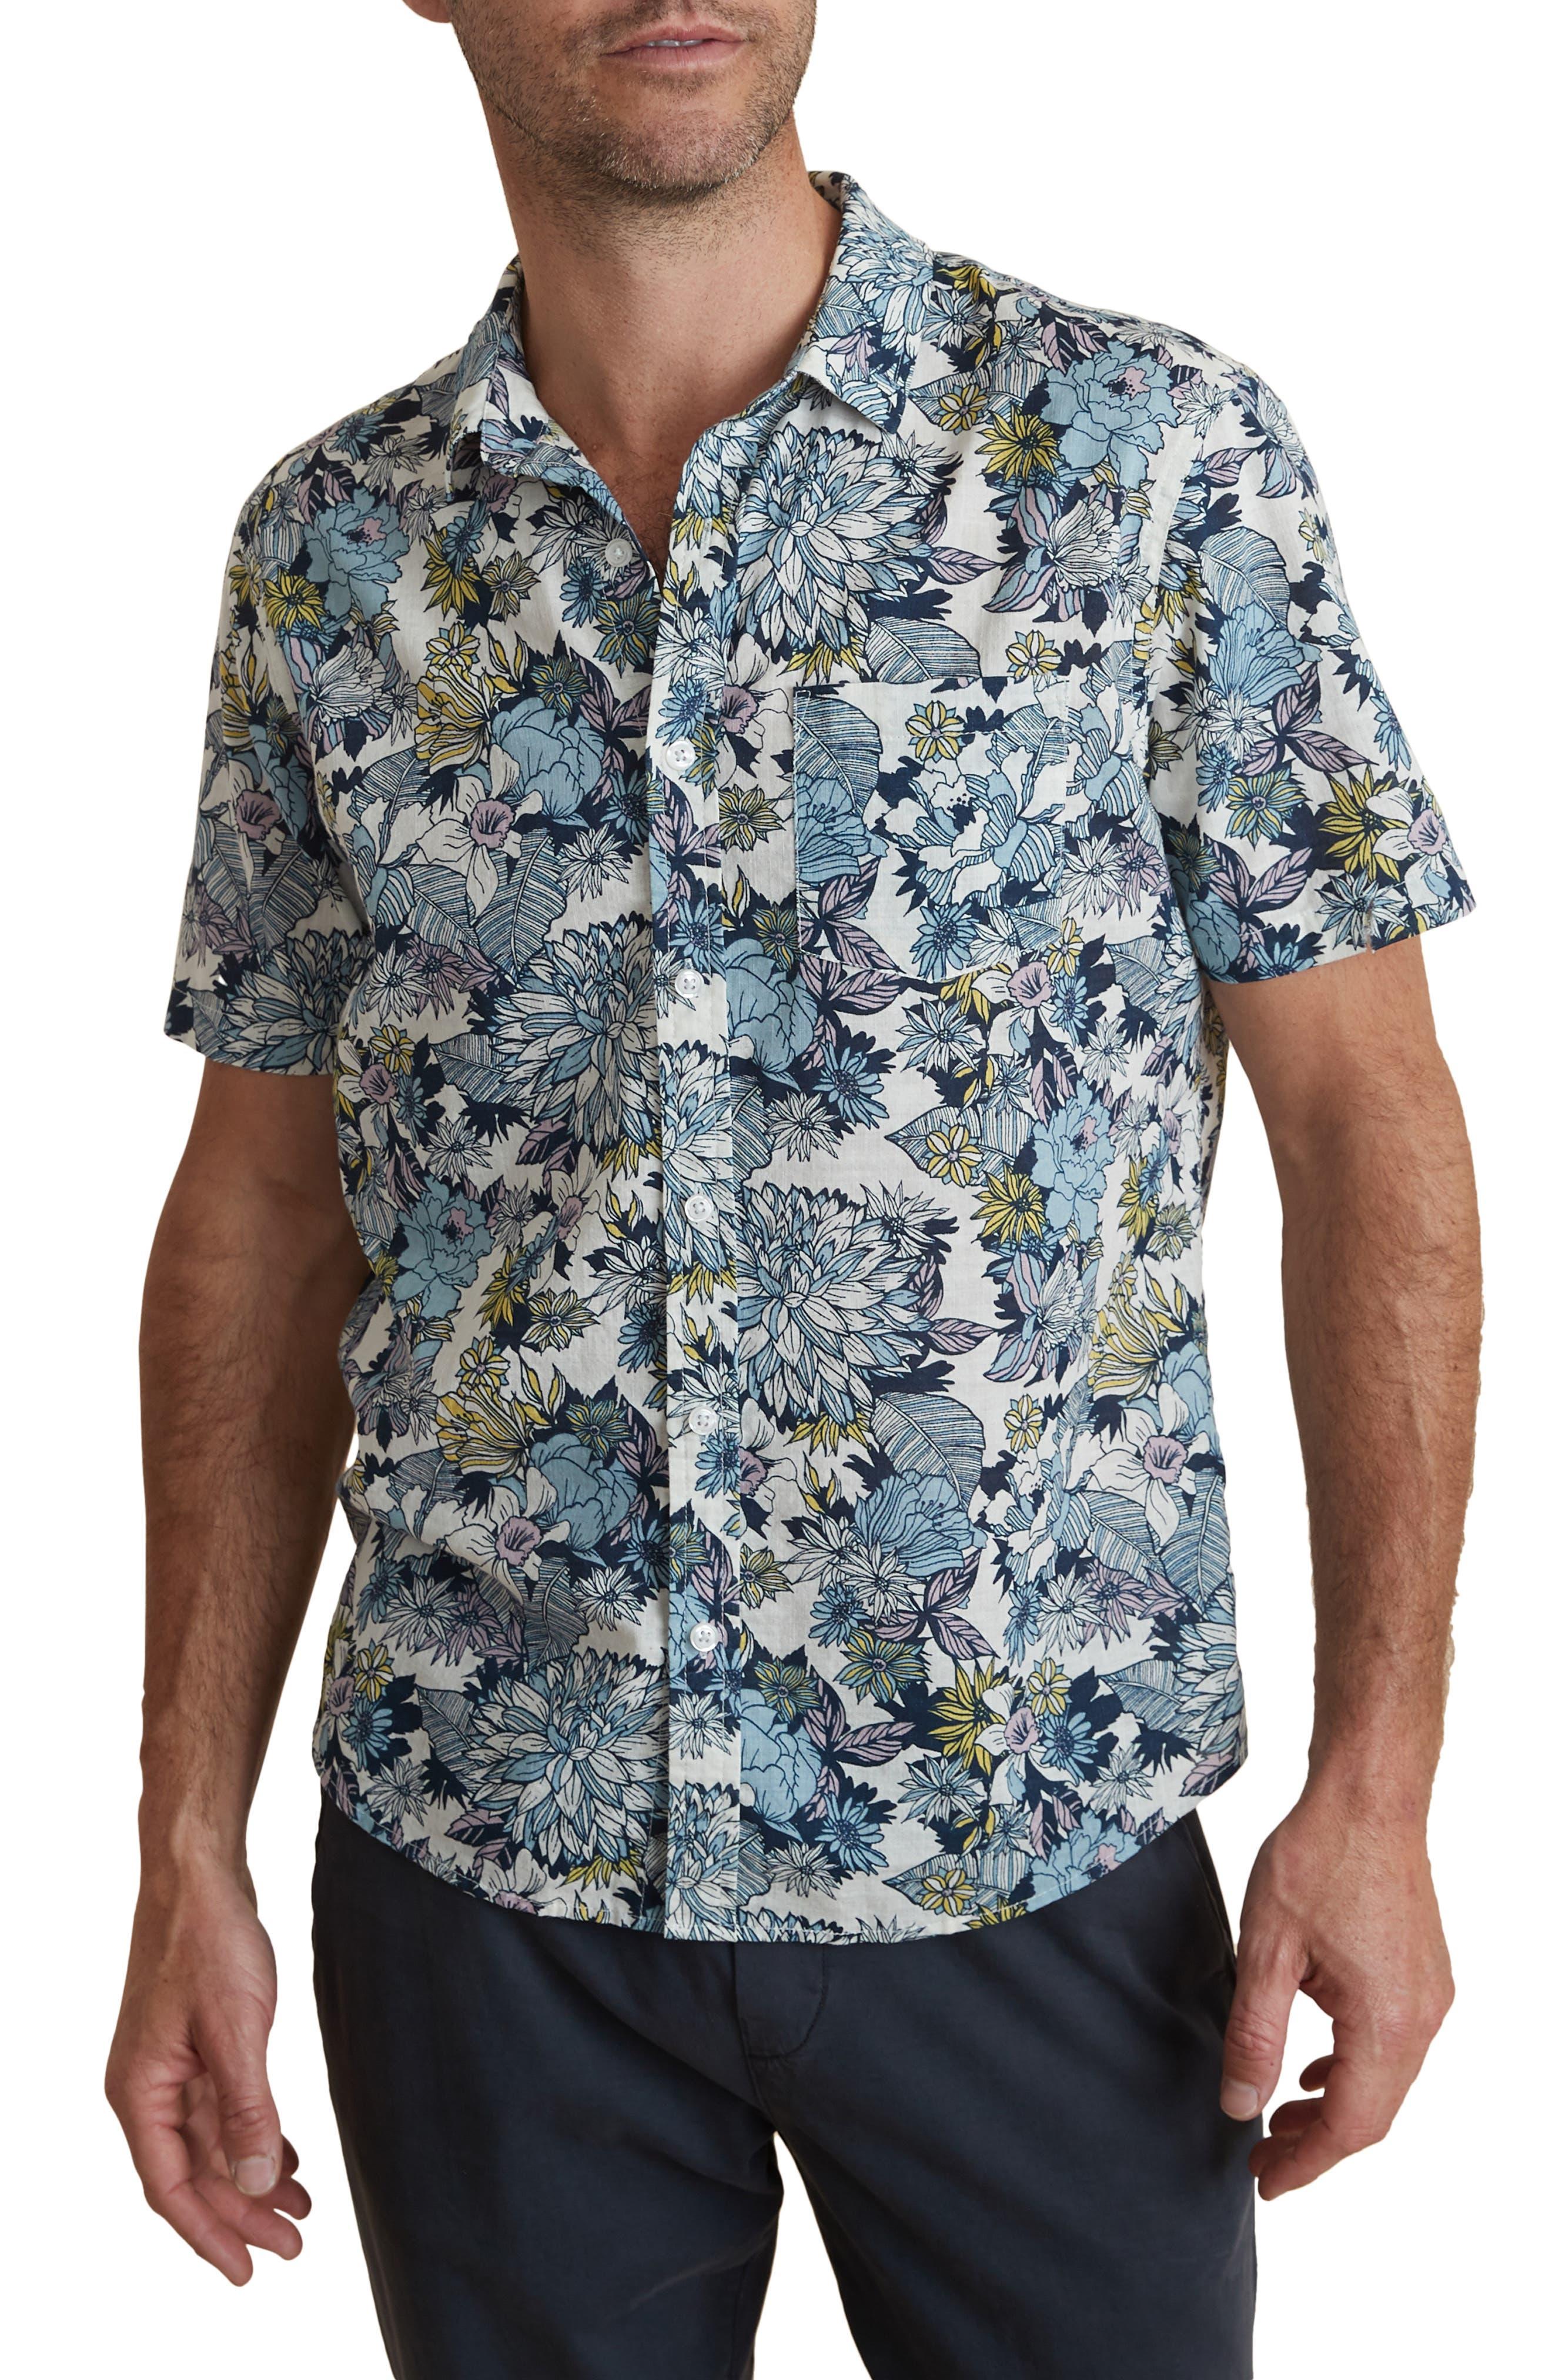 Bolton Tropical Short Sleeve Button-Up Shirt